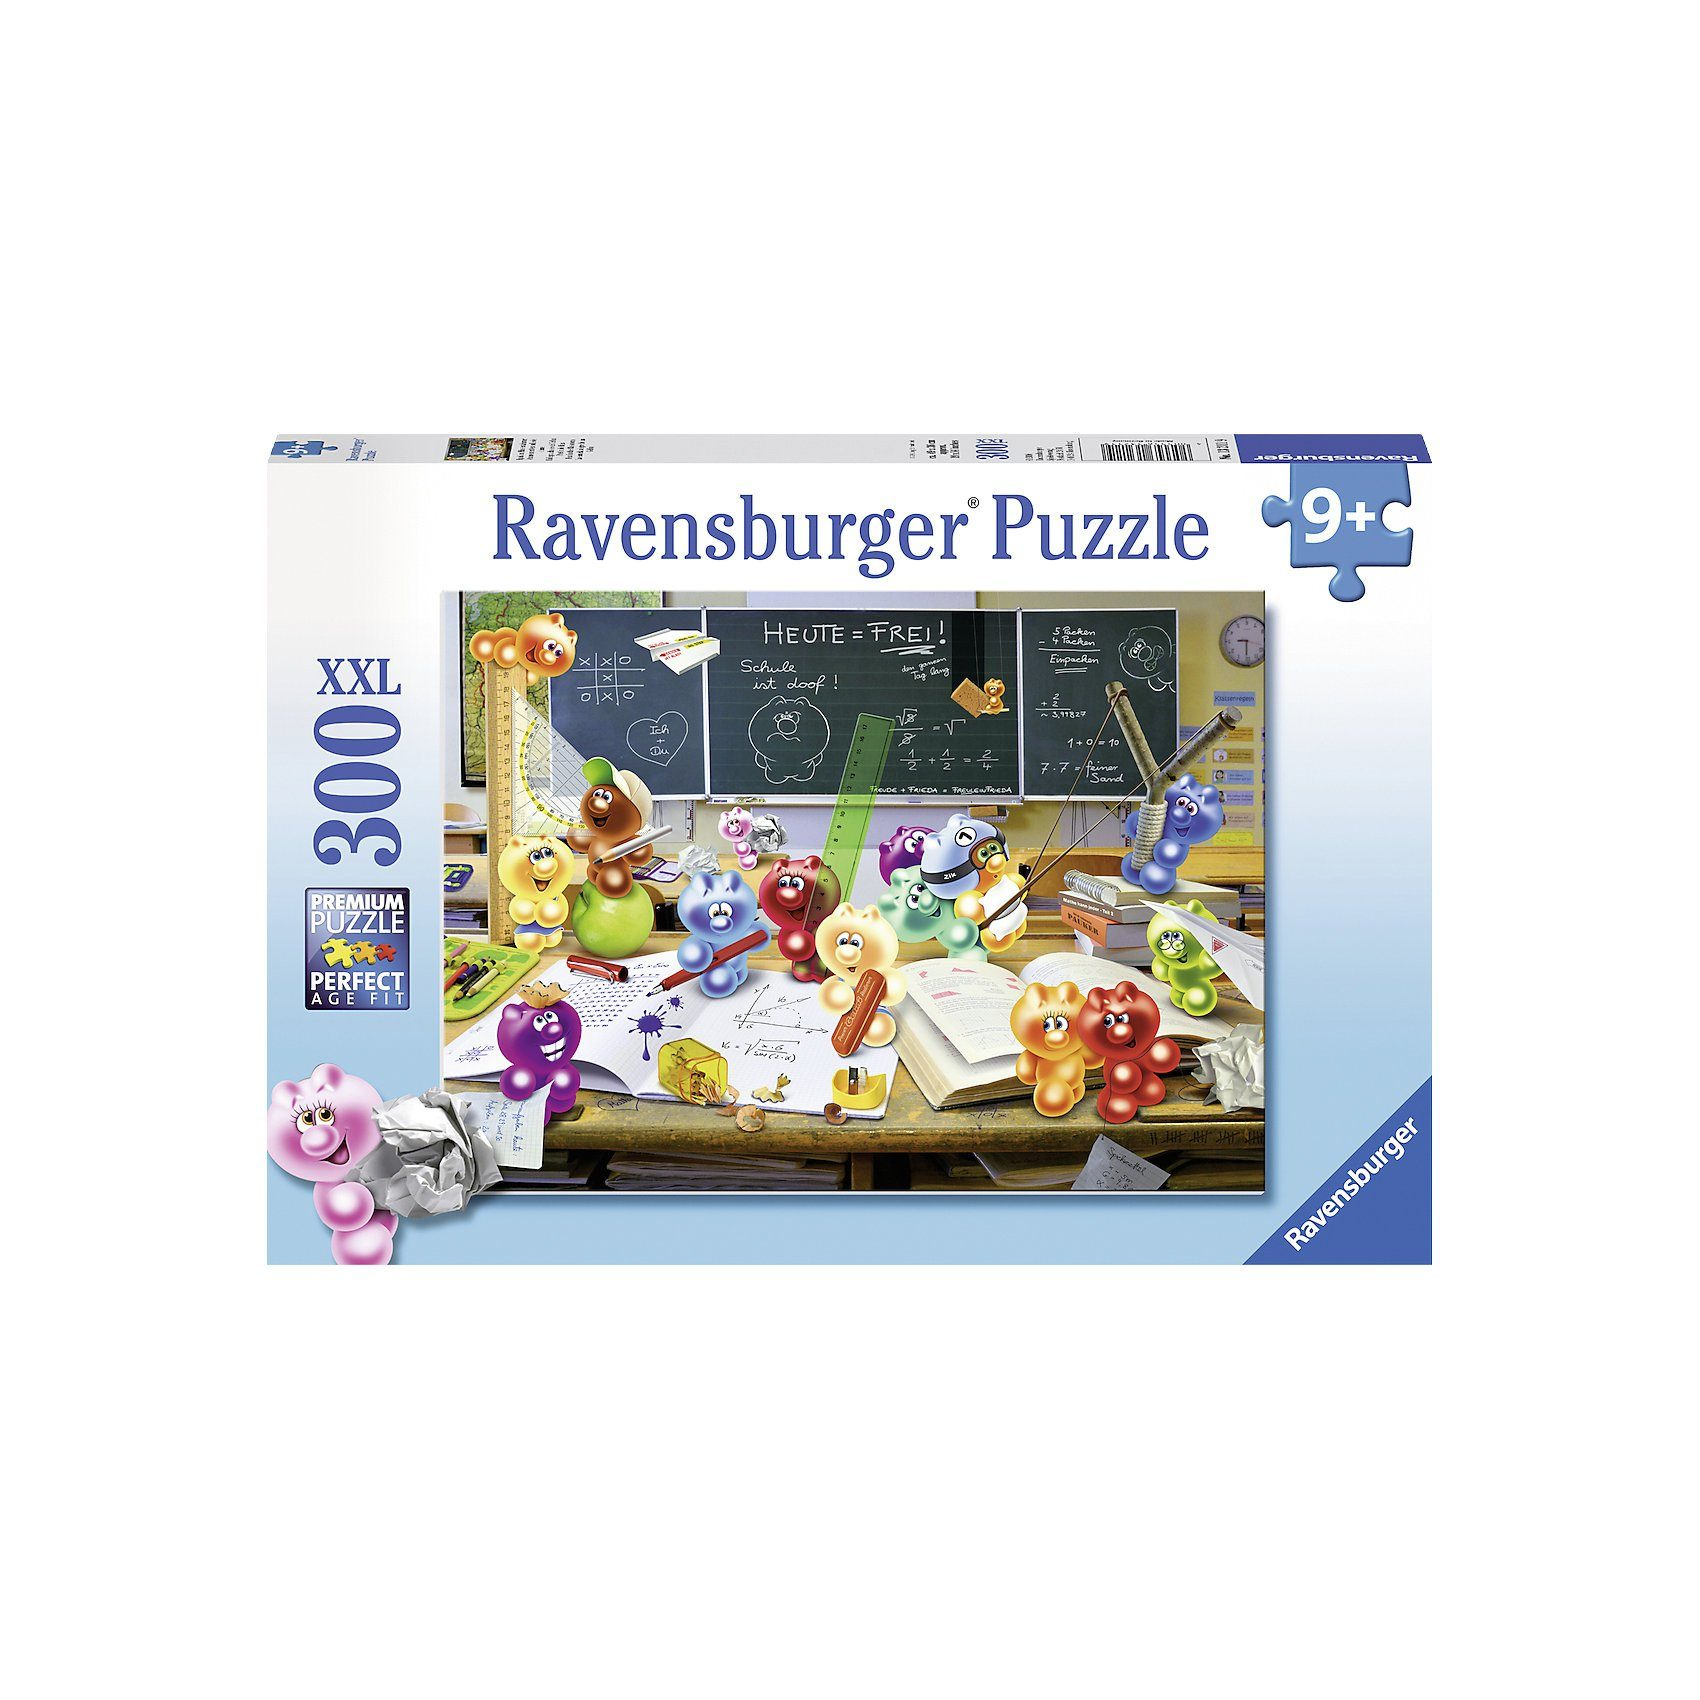 Ravensburger Puzzle 300 Teile Gelini: Spaß im Klassenzimmer